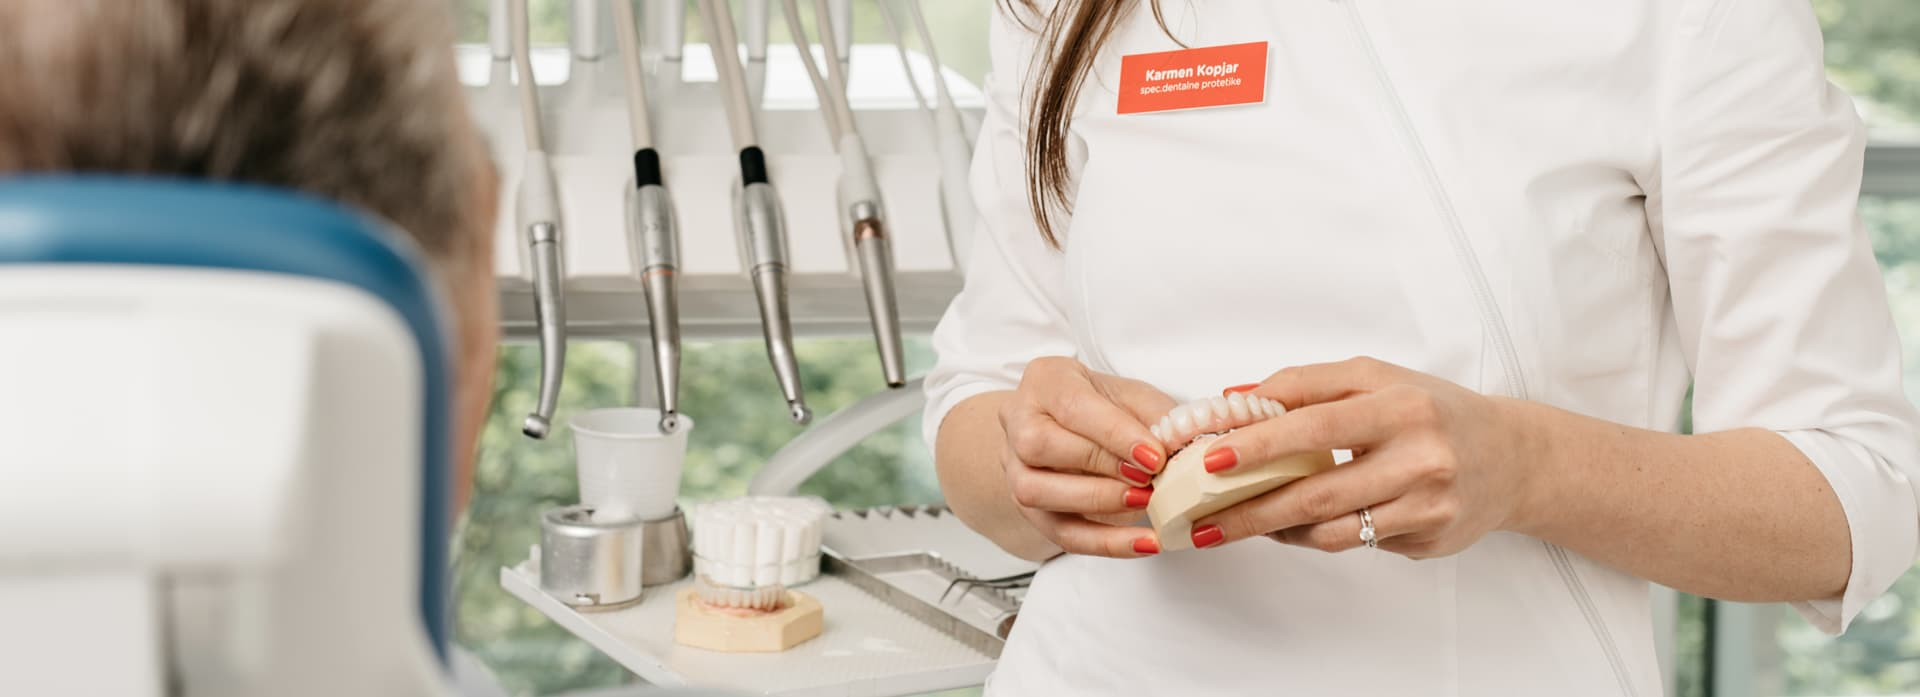 ALL-ON-4 metoda   Štimac Centar dentalne medicine